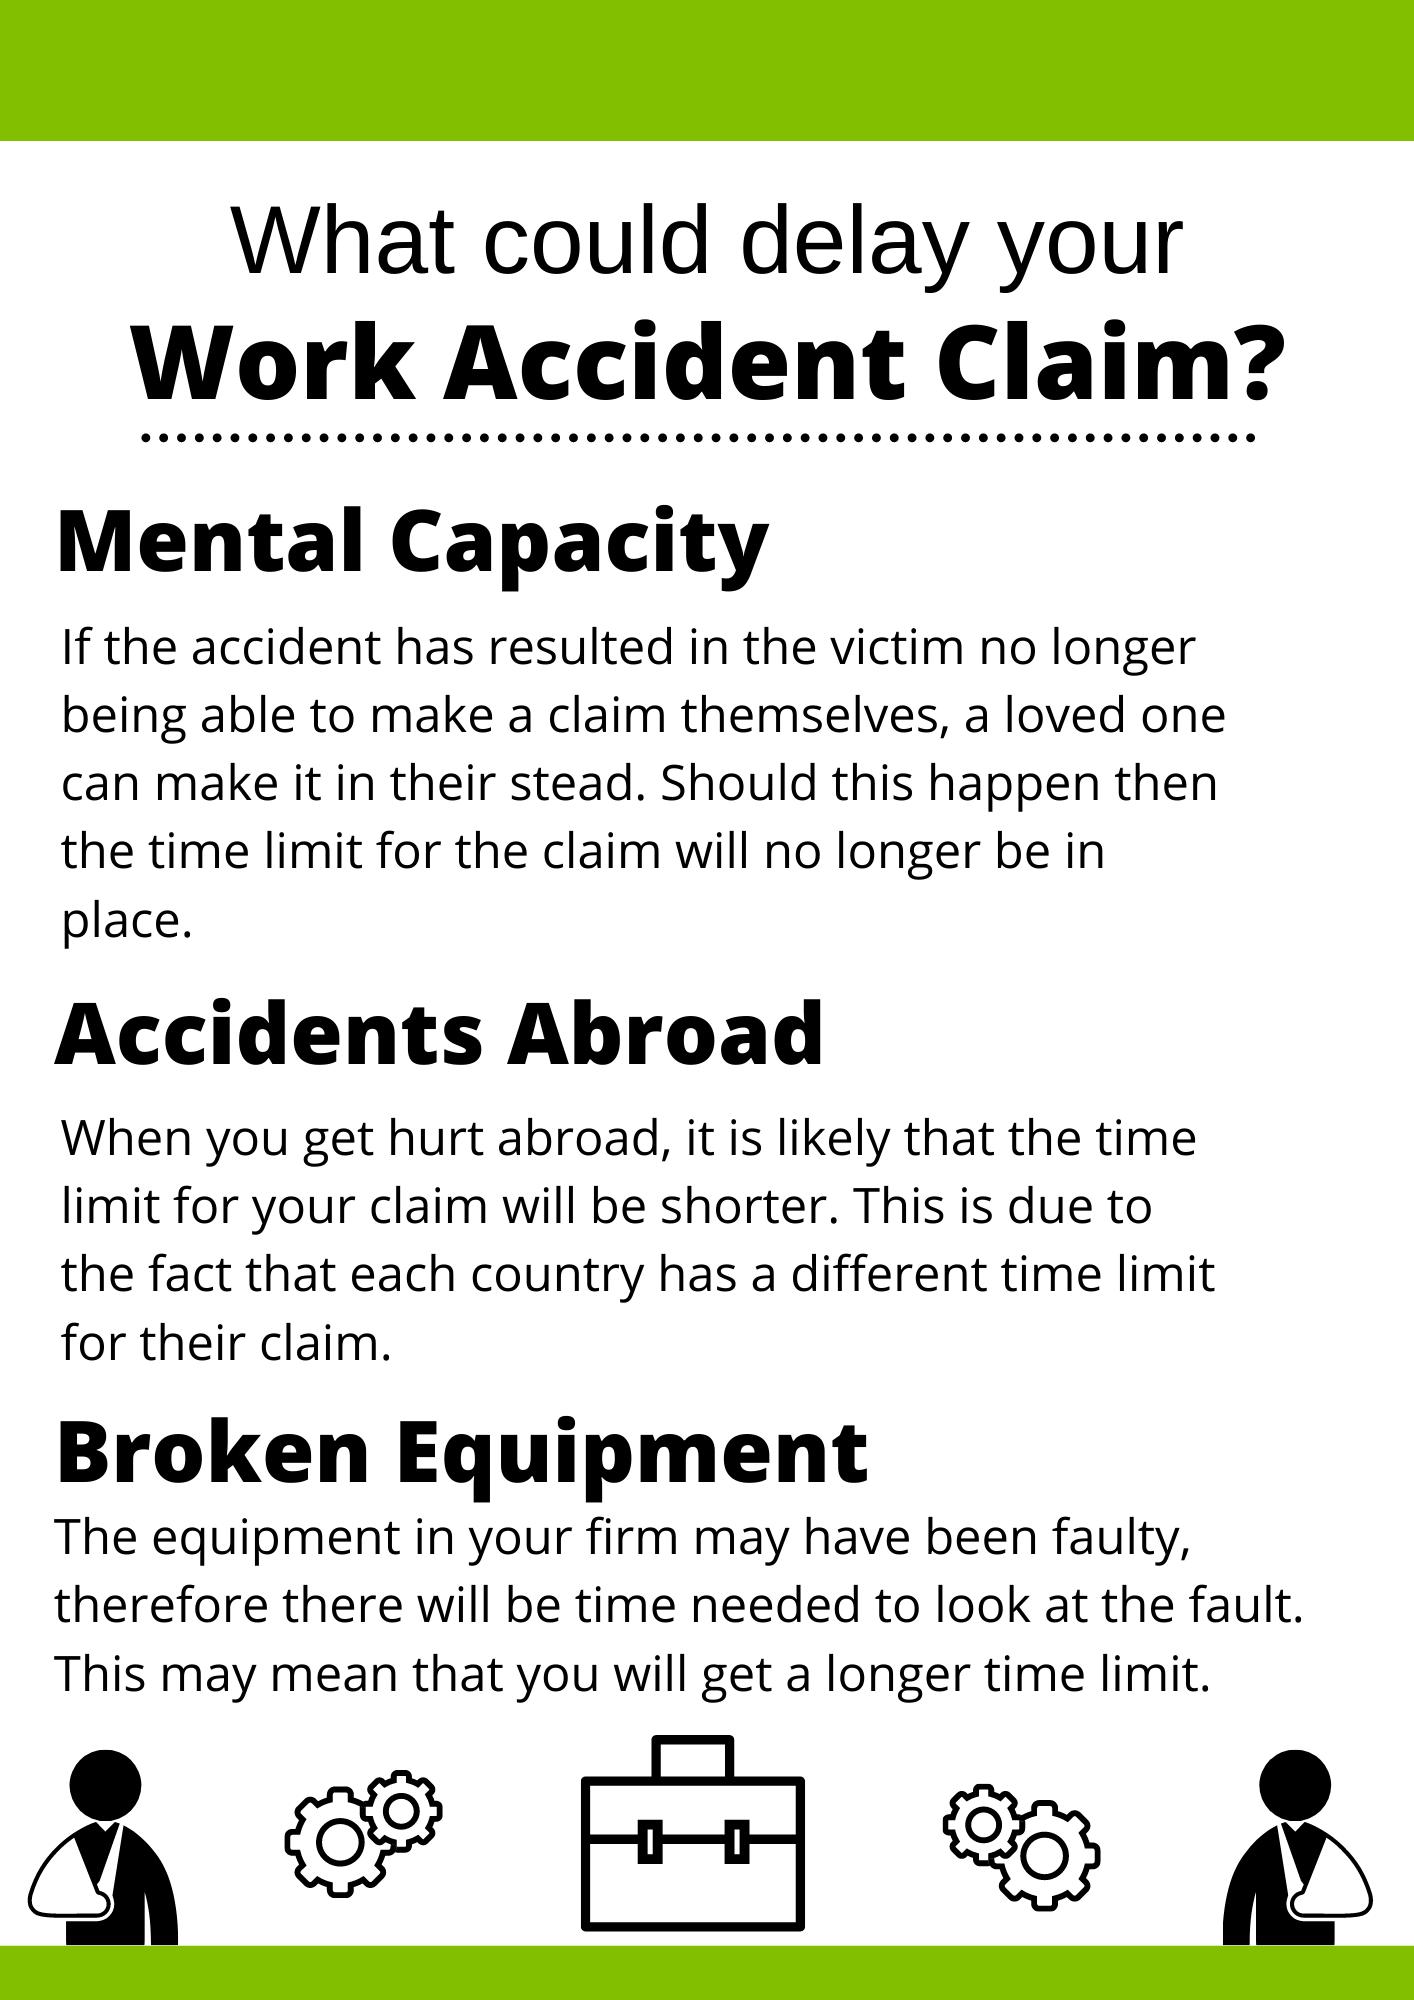 Work Accident Claim Delays